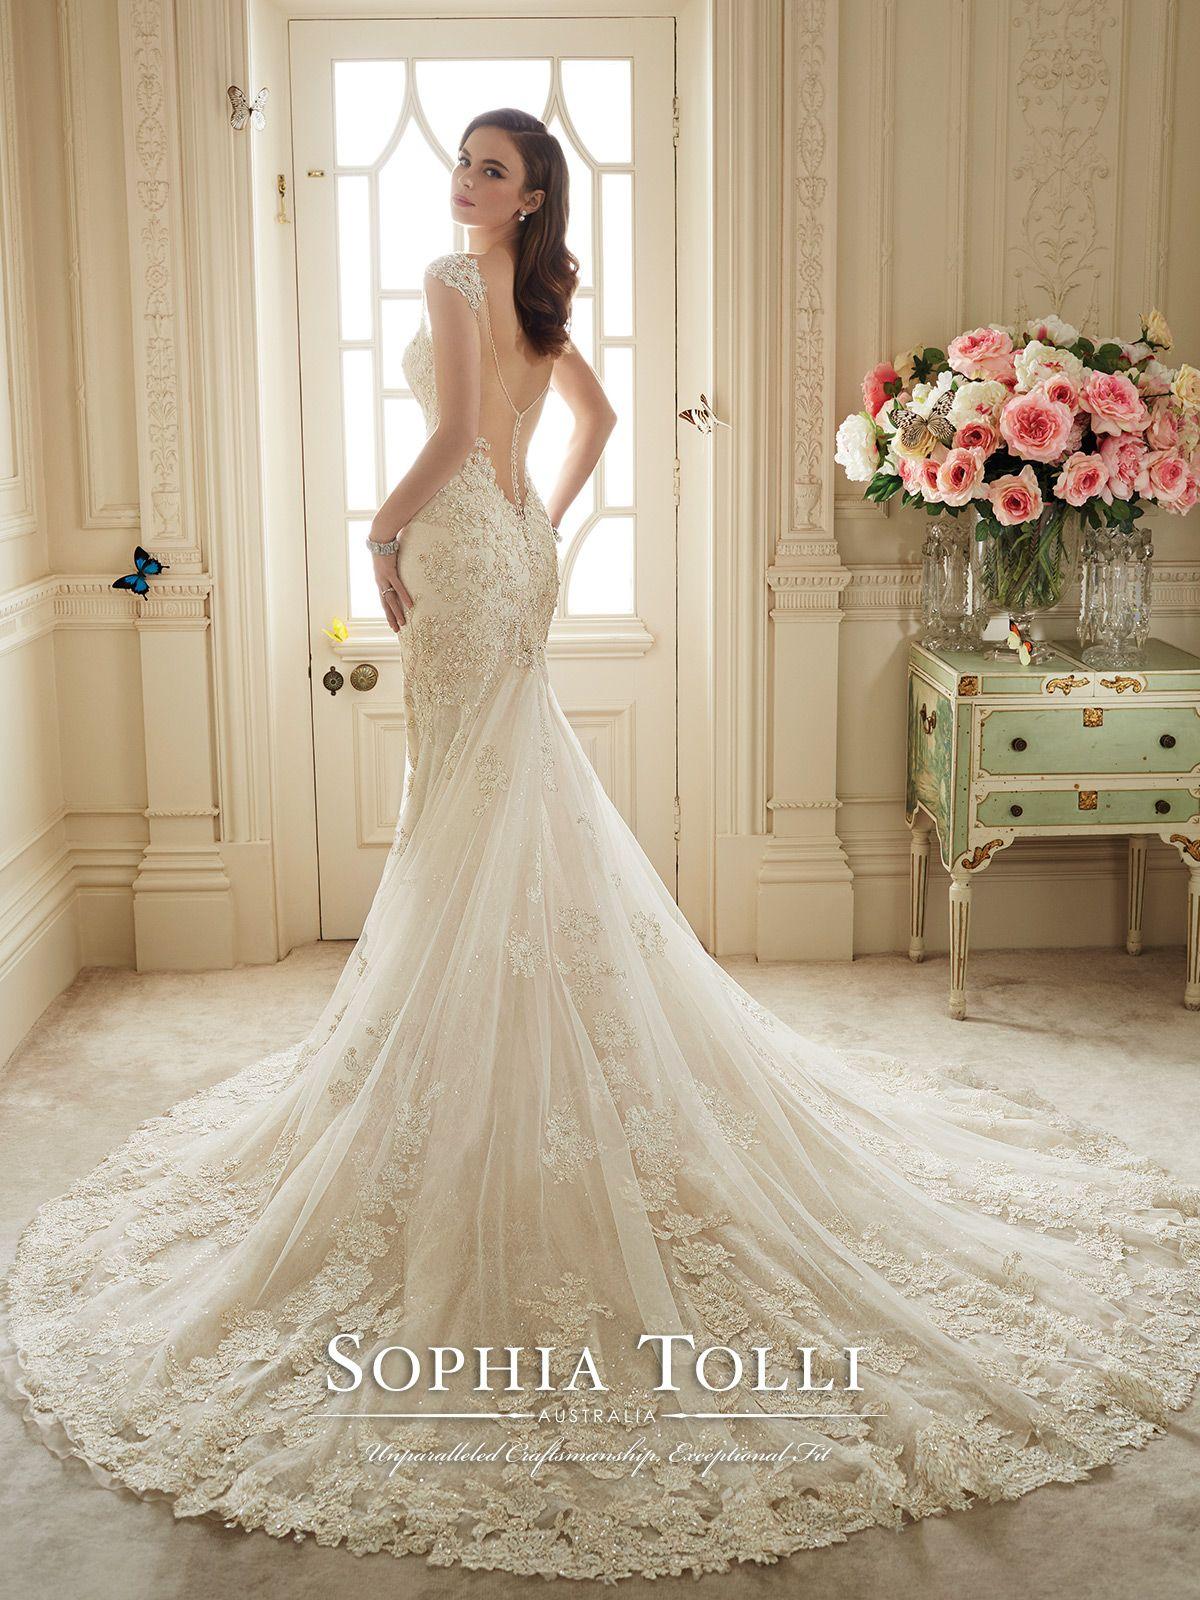 Bridal Dresses Sophia Tolli Wedding Dress Styles Sophia Tolli Wedding Dresses Wedding Dresses